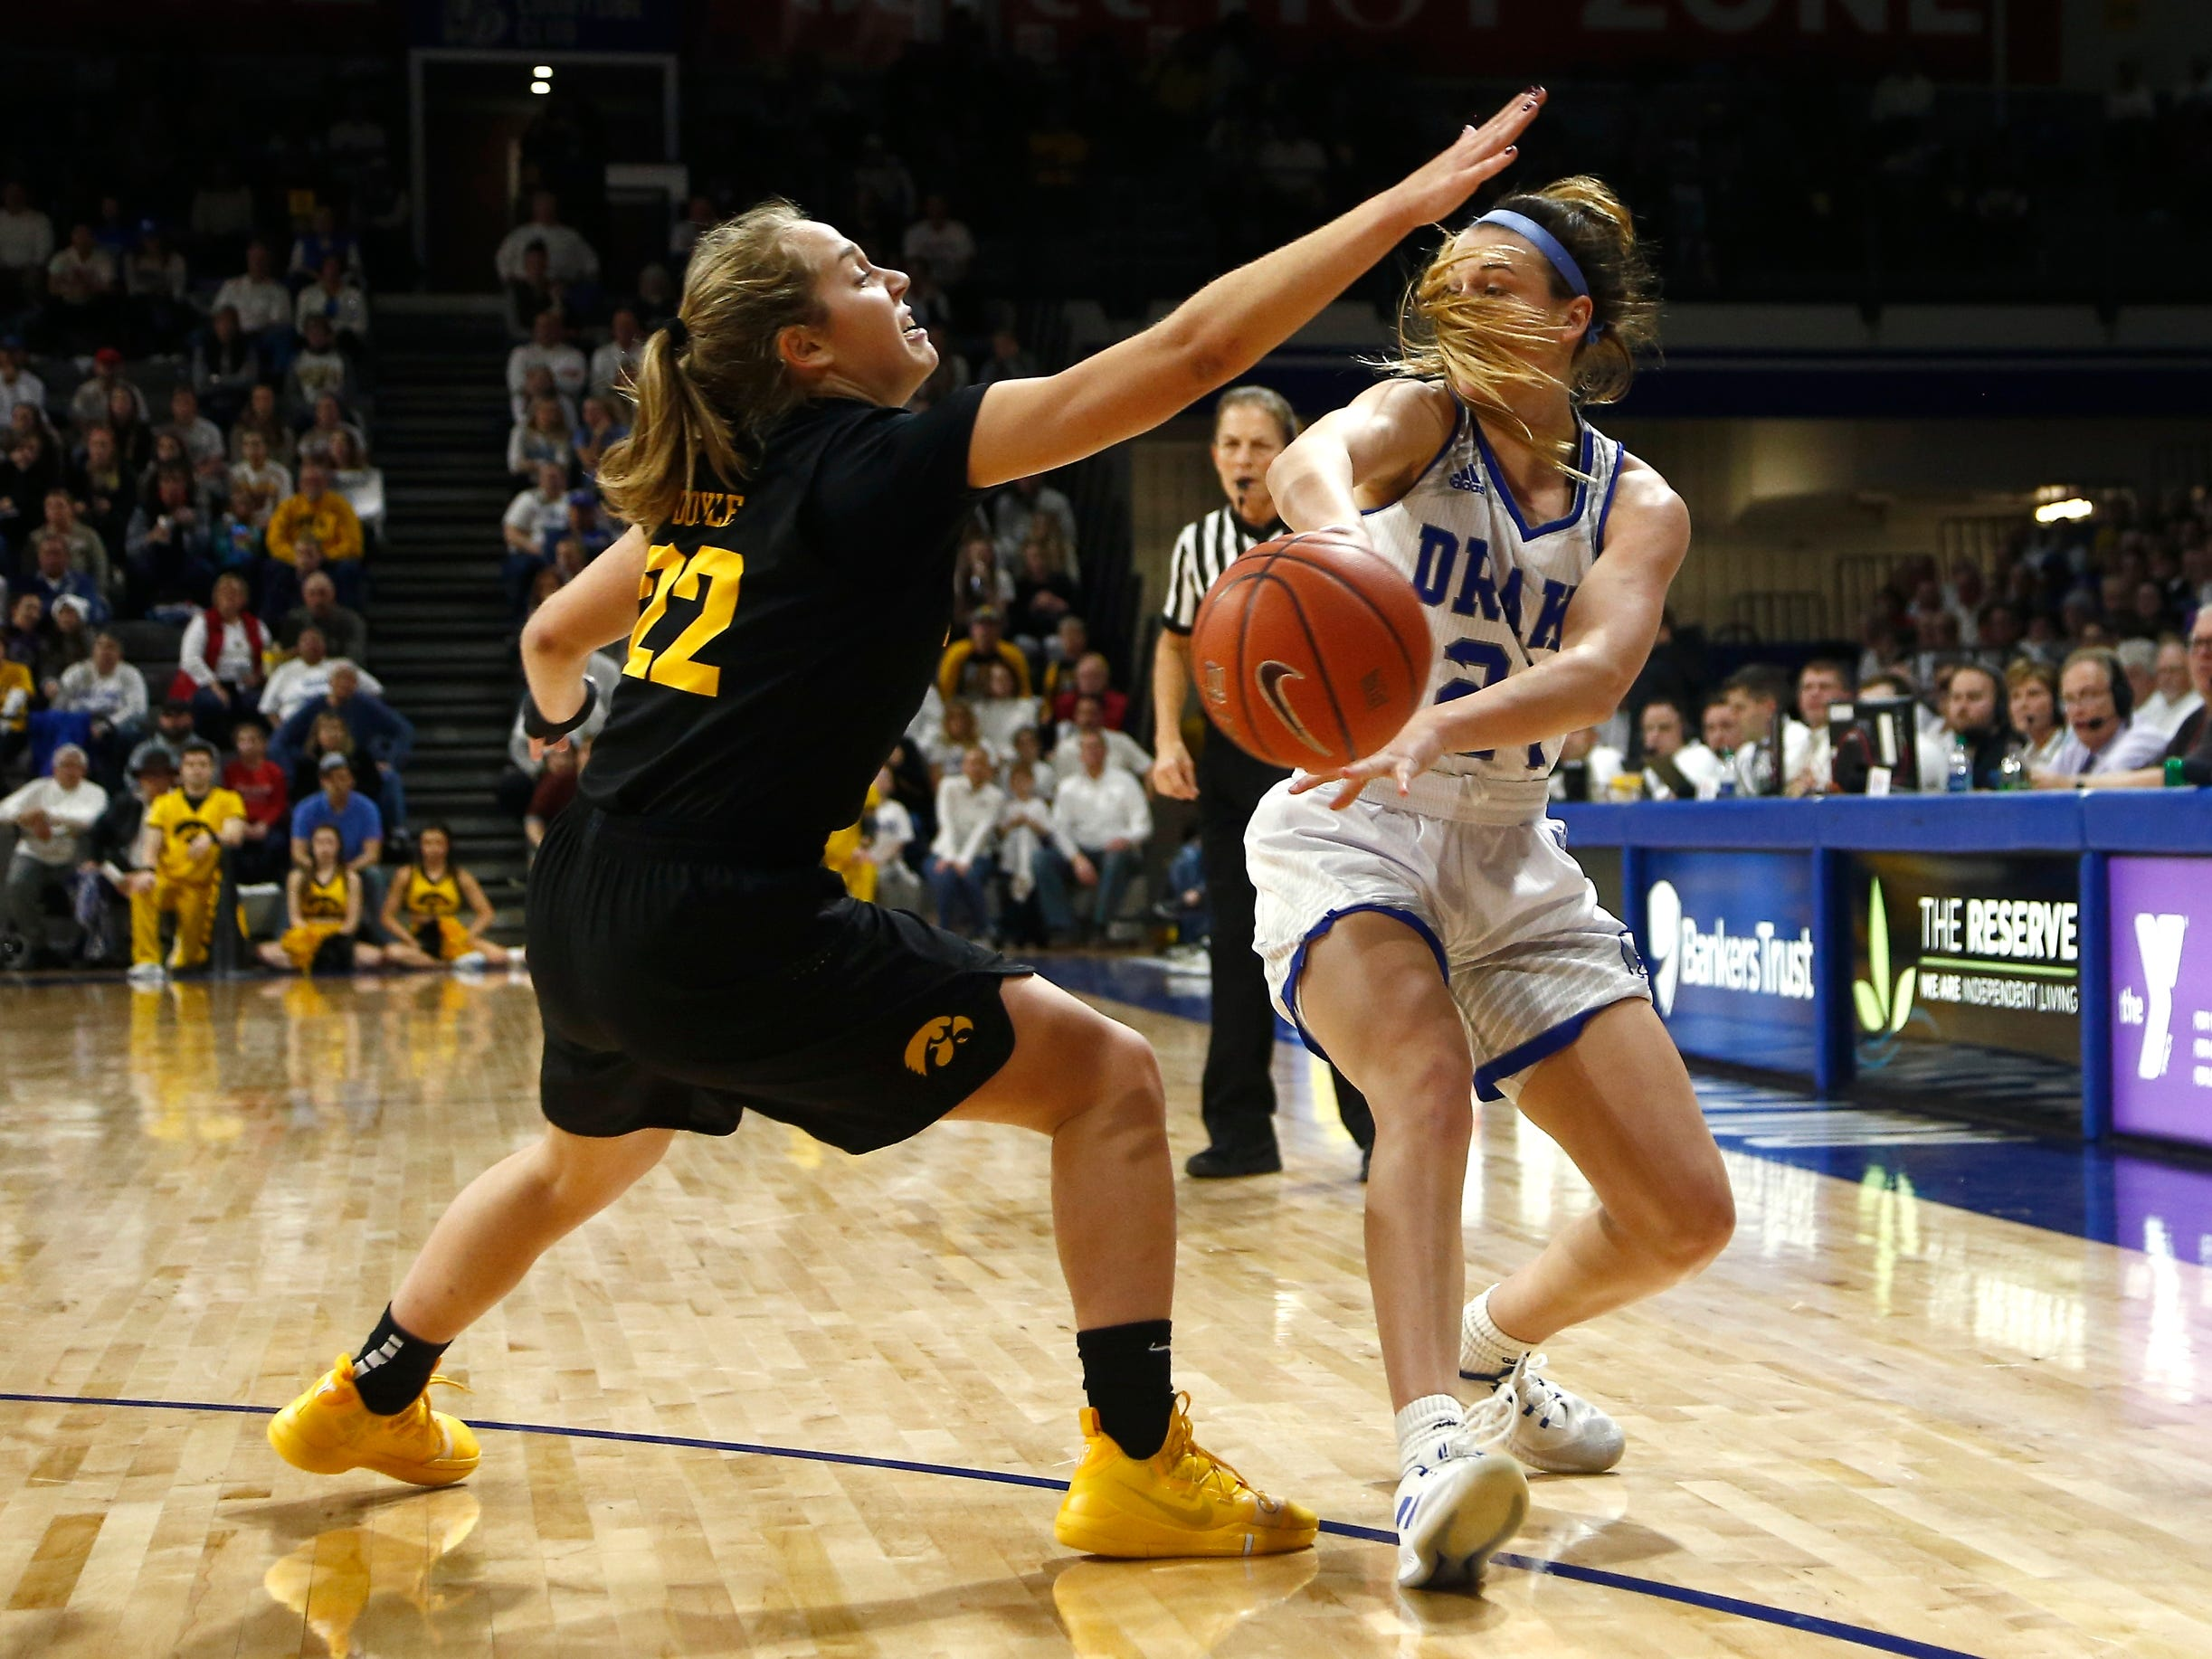 Drake's SammieBachrodt (21) passes around Iowa's Kathleen Doyle (22) during their basketball game on Friday, Dec. 21, 2018, in Des Moines. Drake takes a 45-43 lead into halftime.